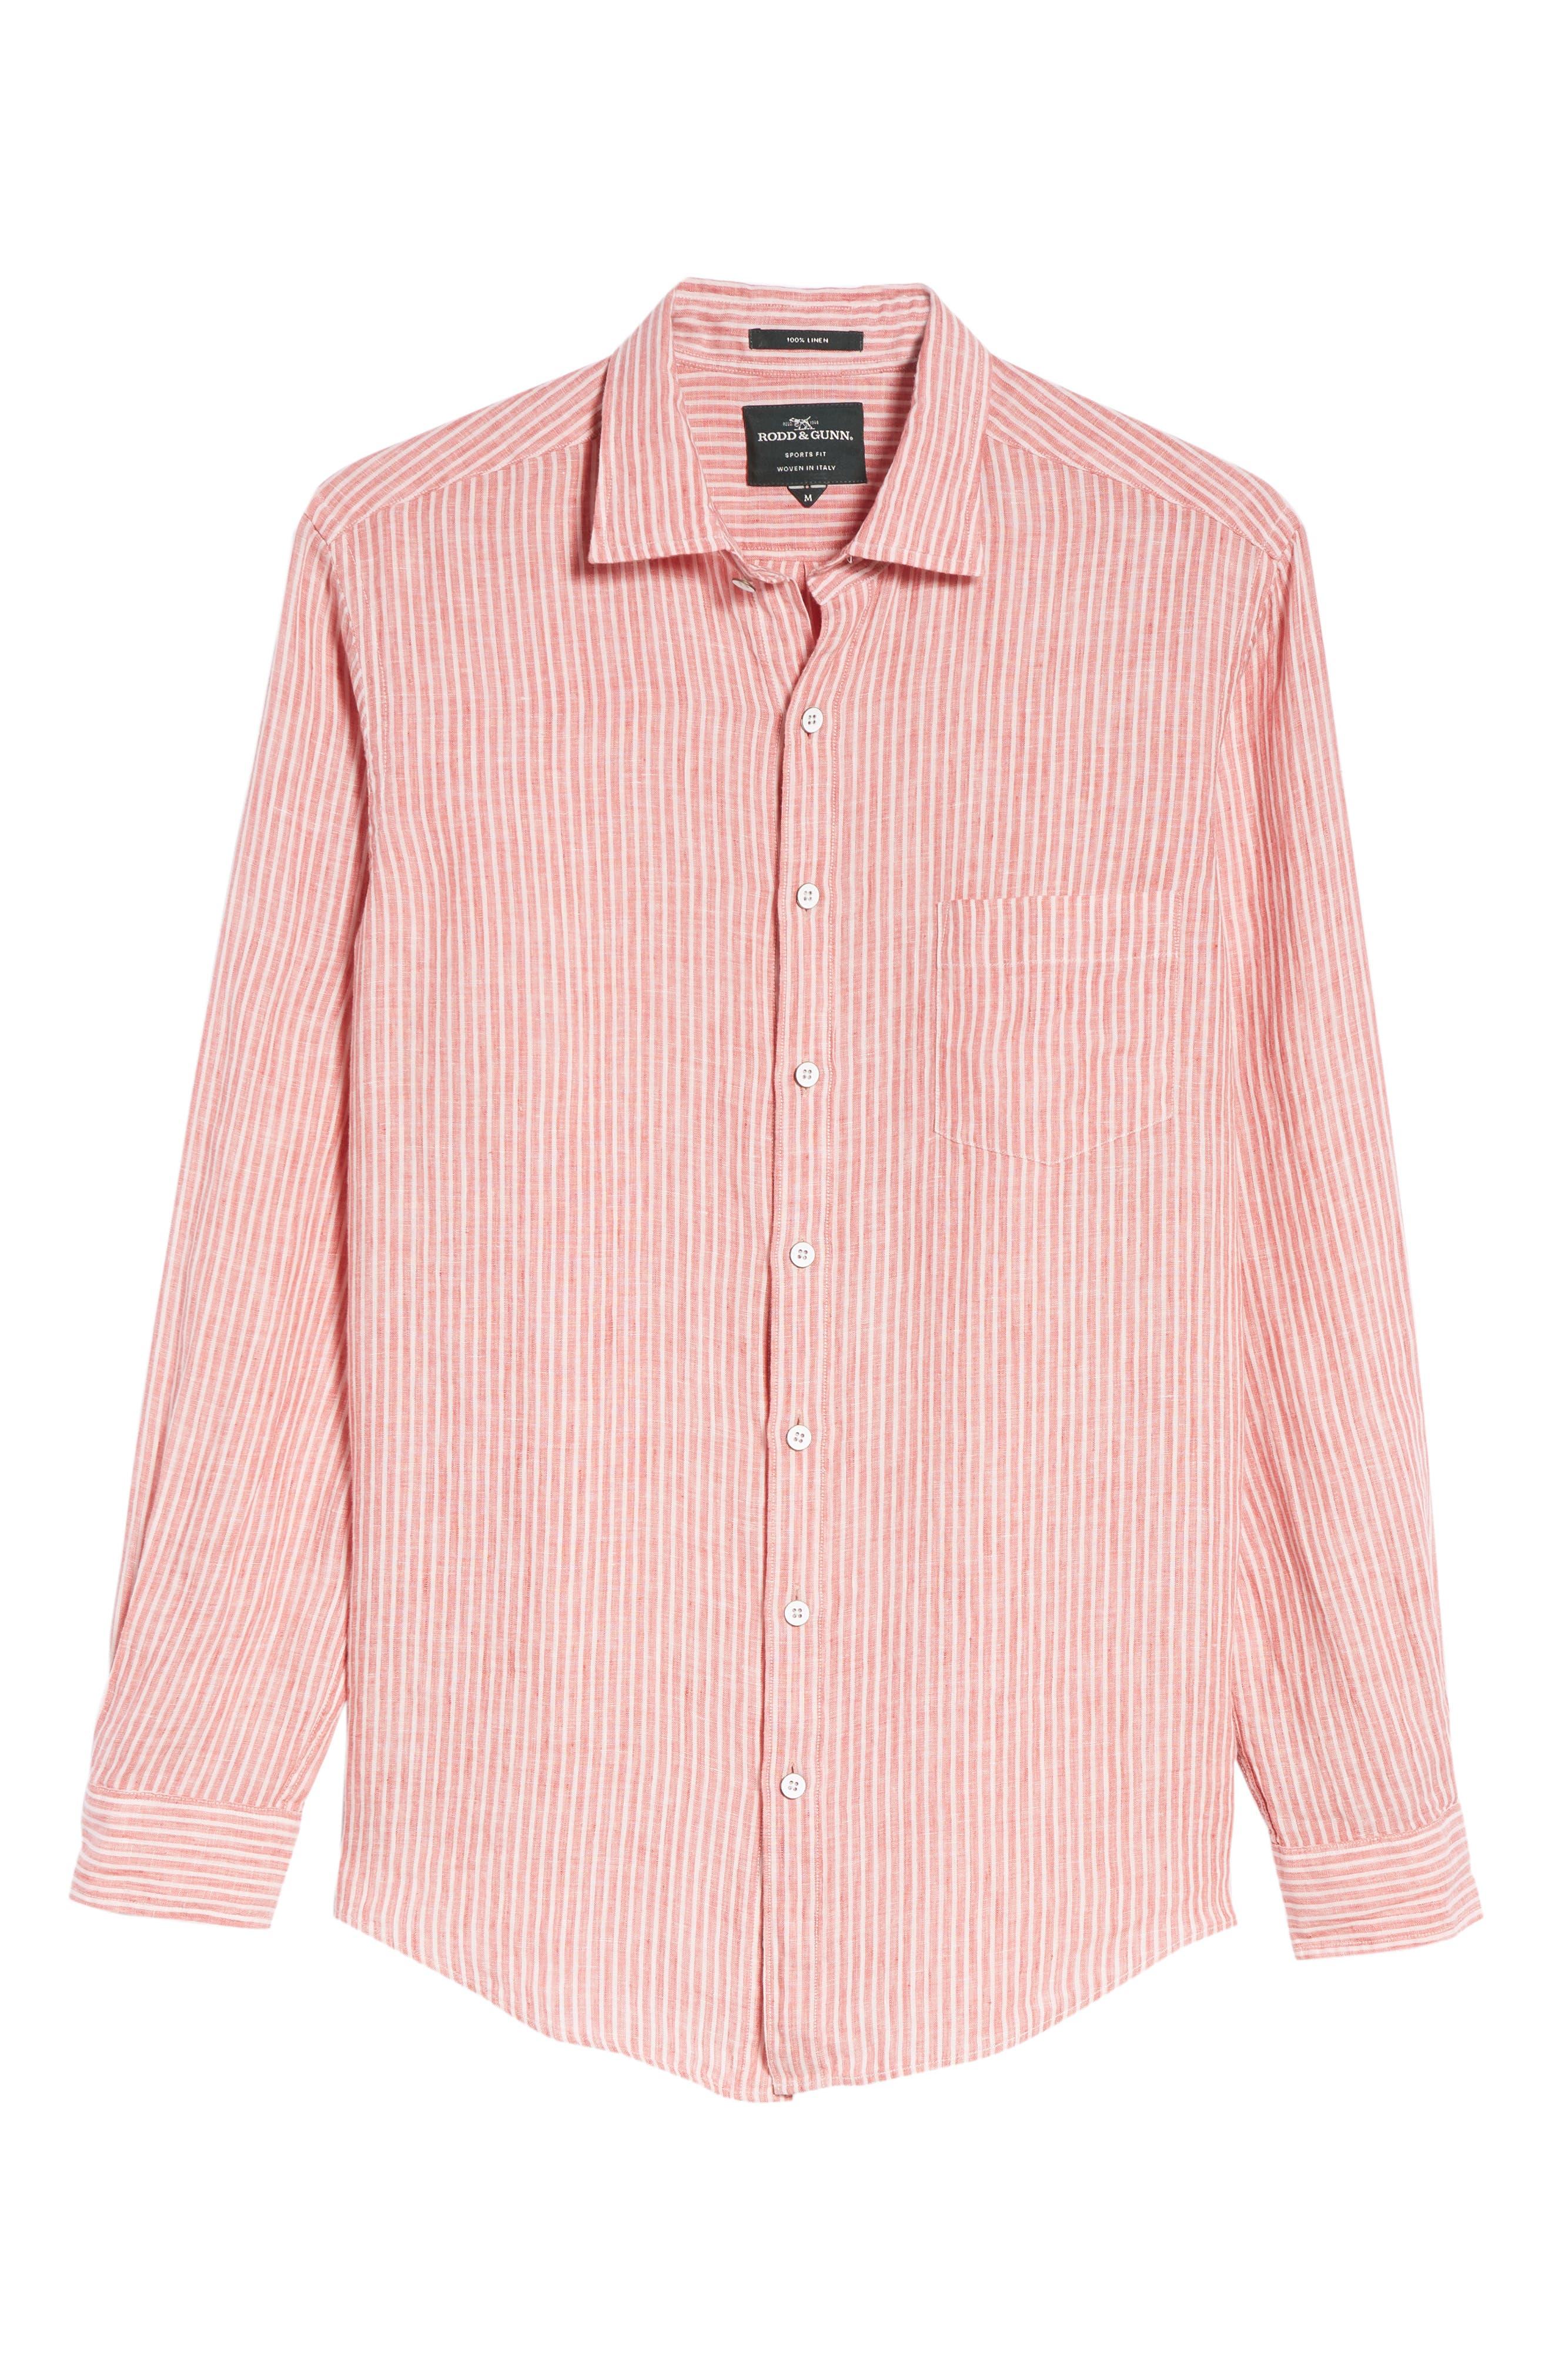 Warwick Junction Stripe Linen Sport Shirt,                             Alternate thumbnail 6, color,                             Coral